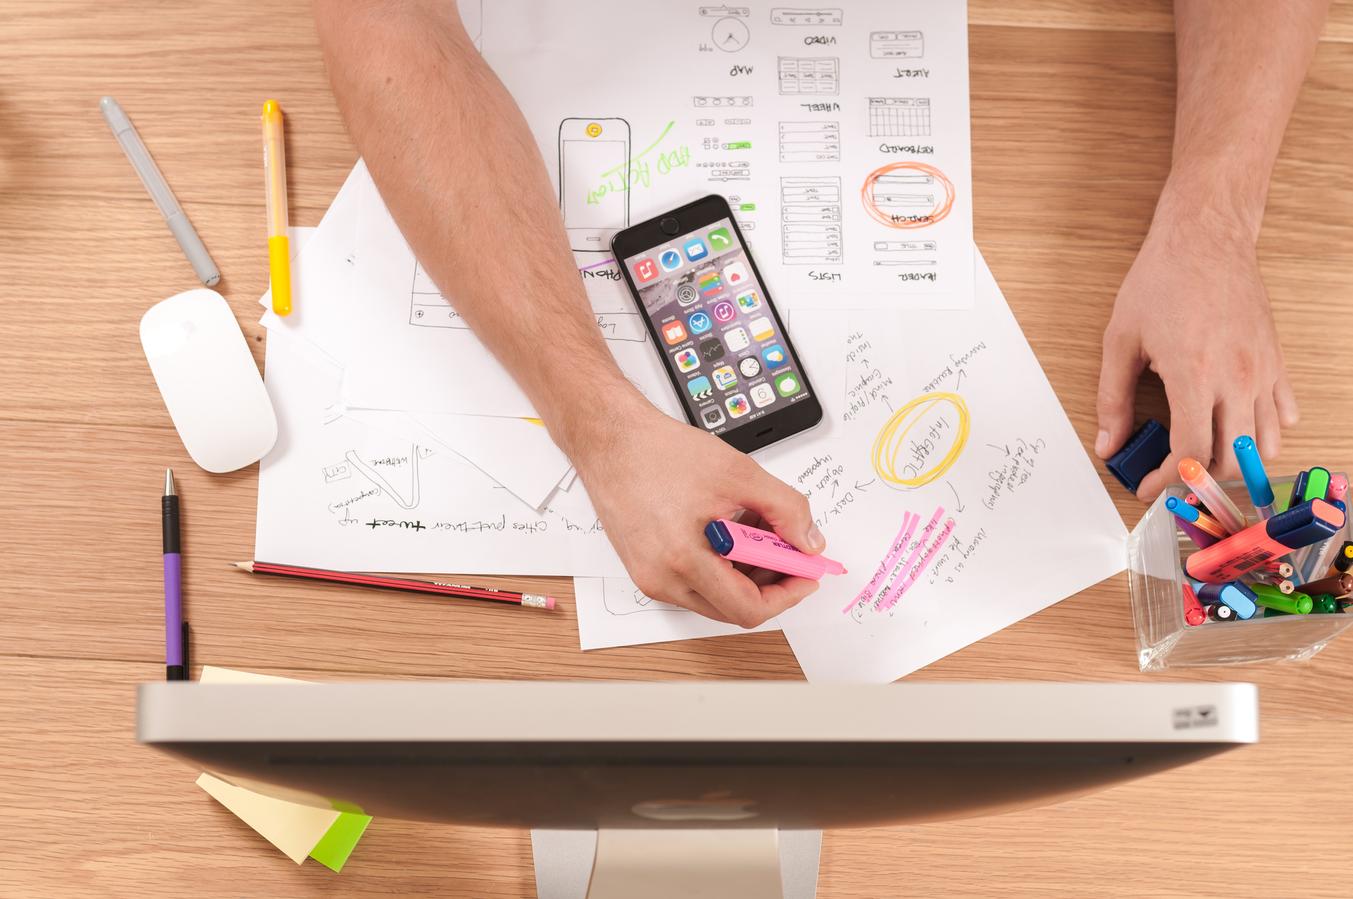 UI/UX Design: Choosing the Best Interface Design for an App